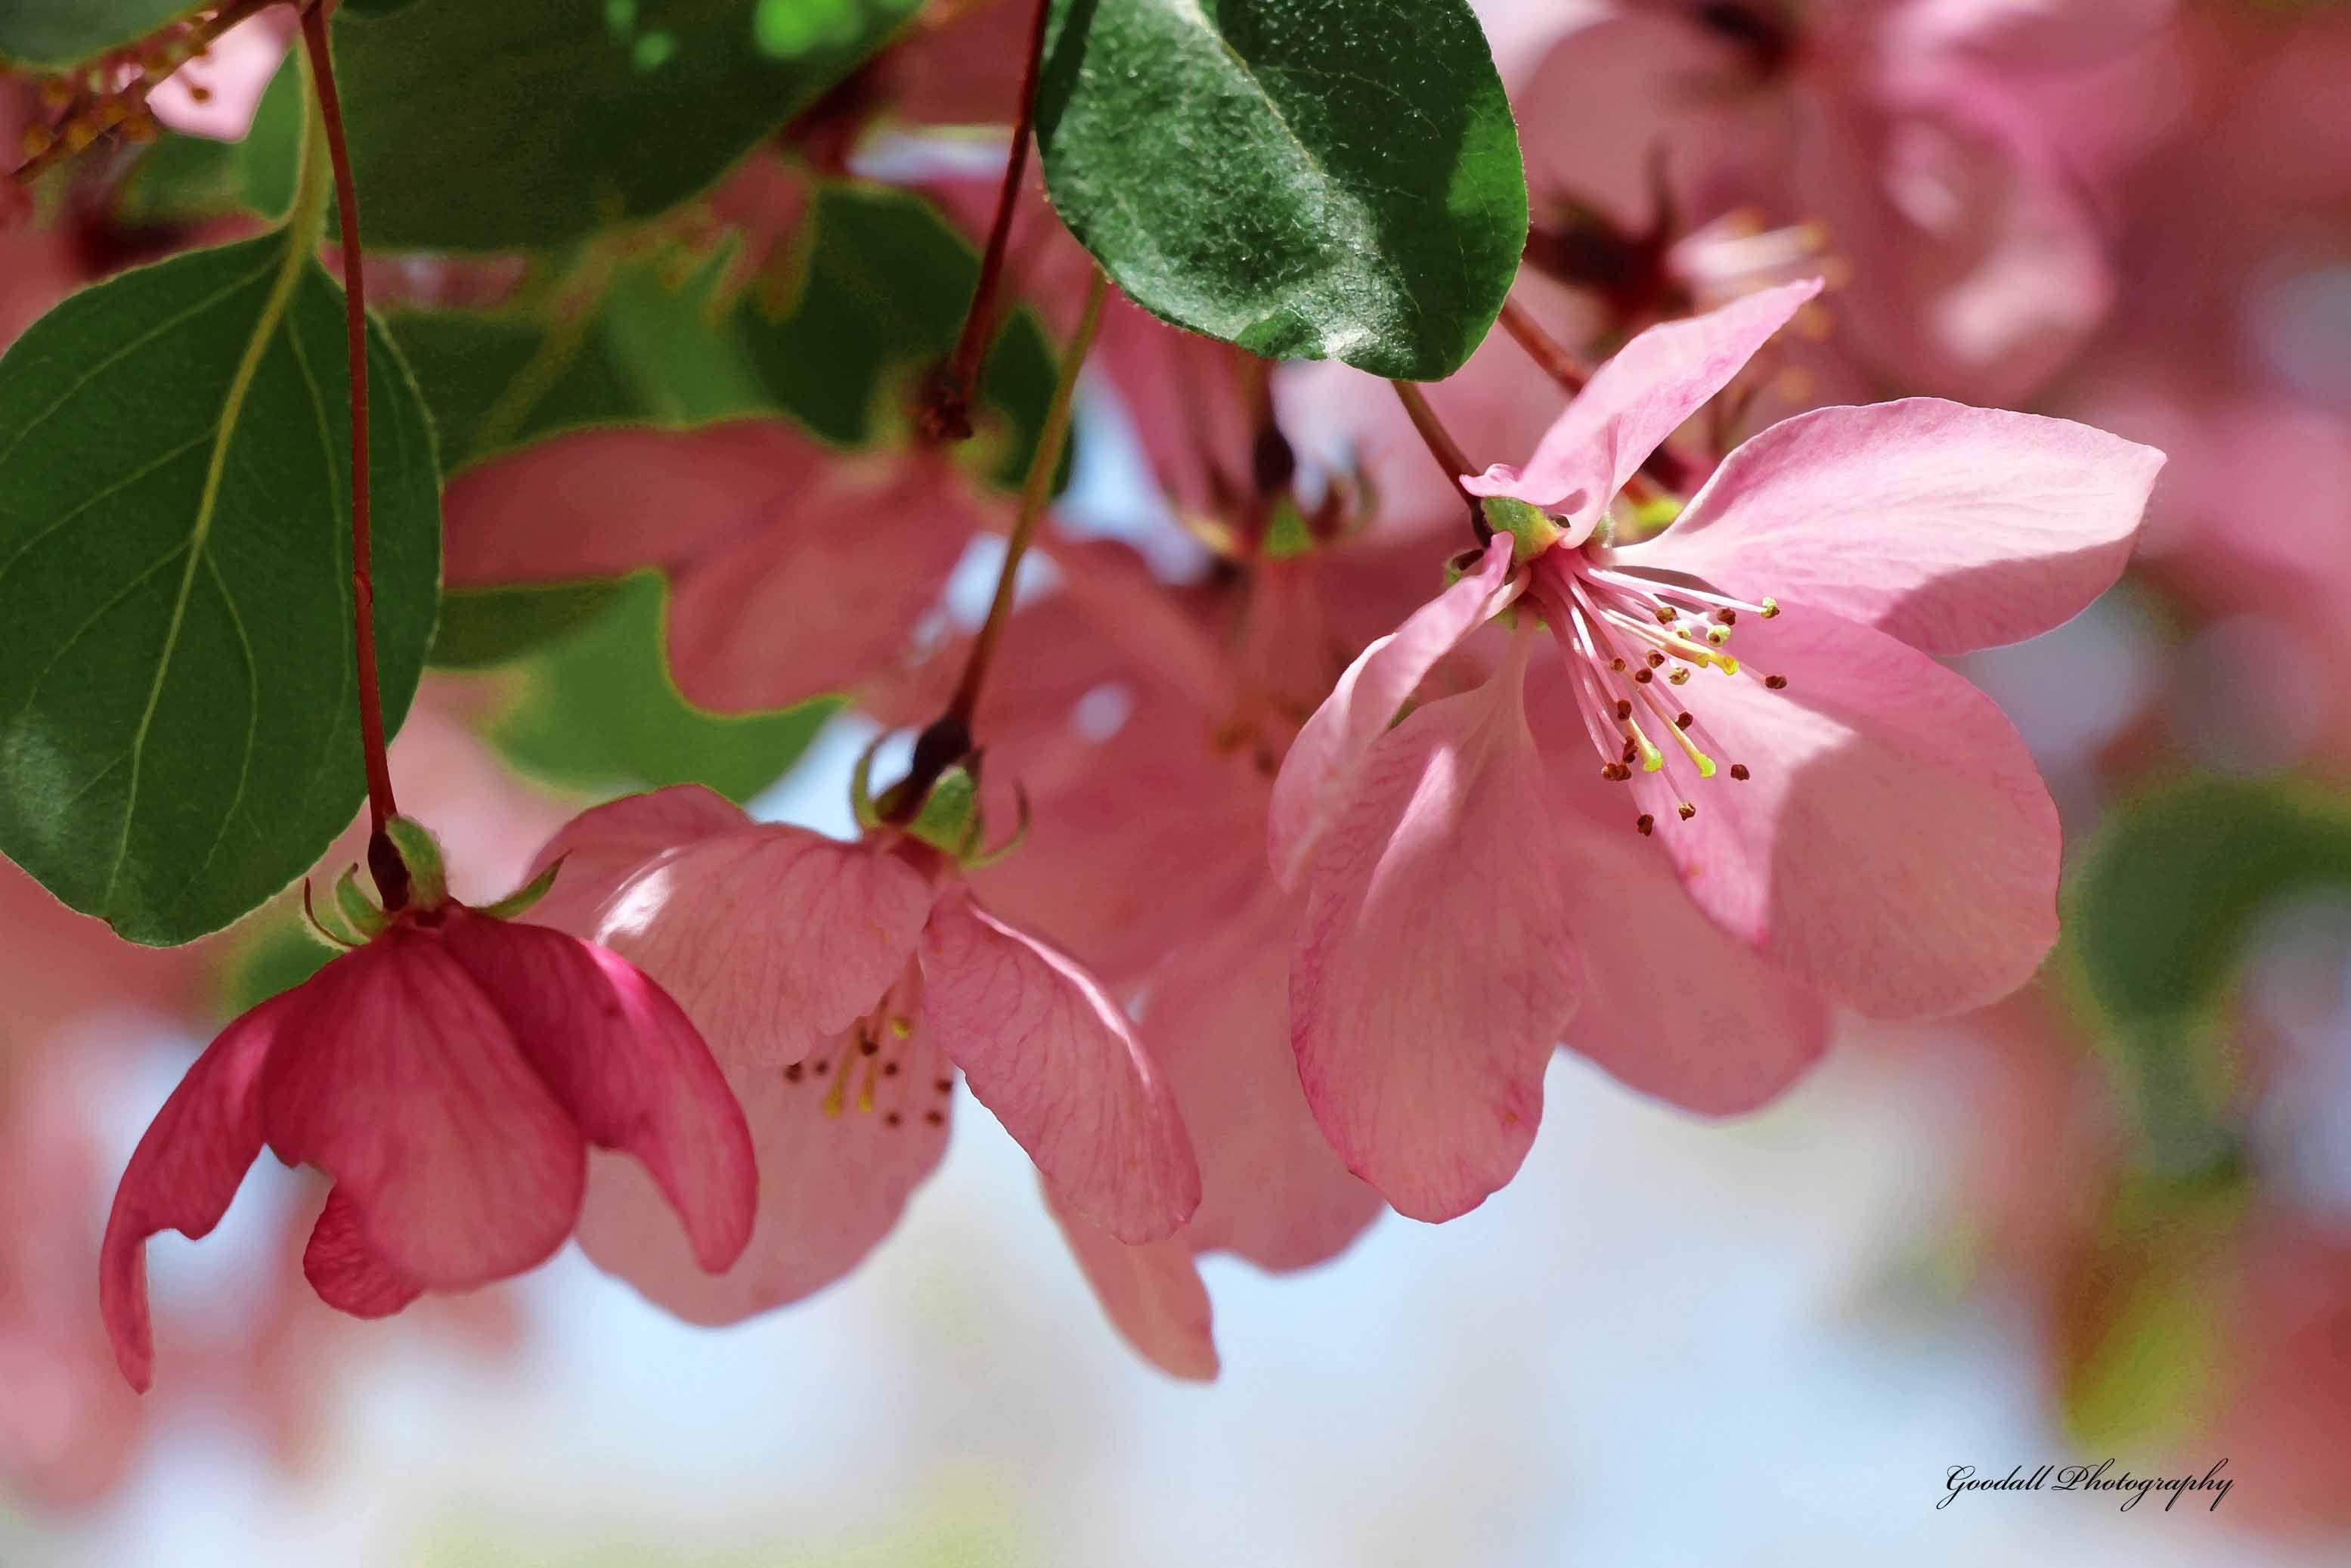 Spring Petals / April 2015 https://www.facebook.com/goodallphoto